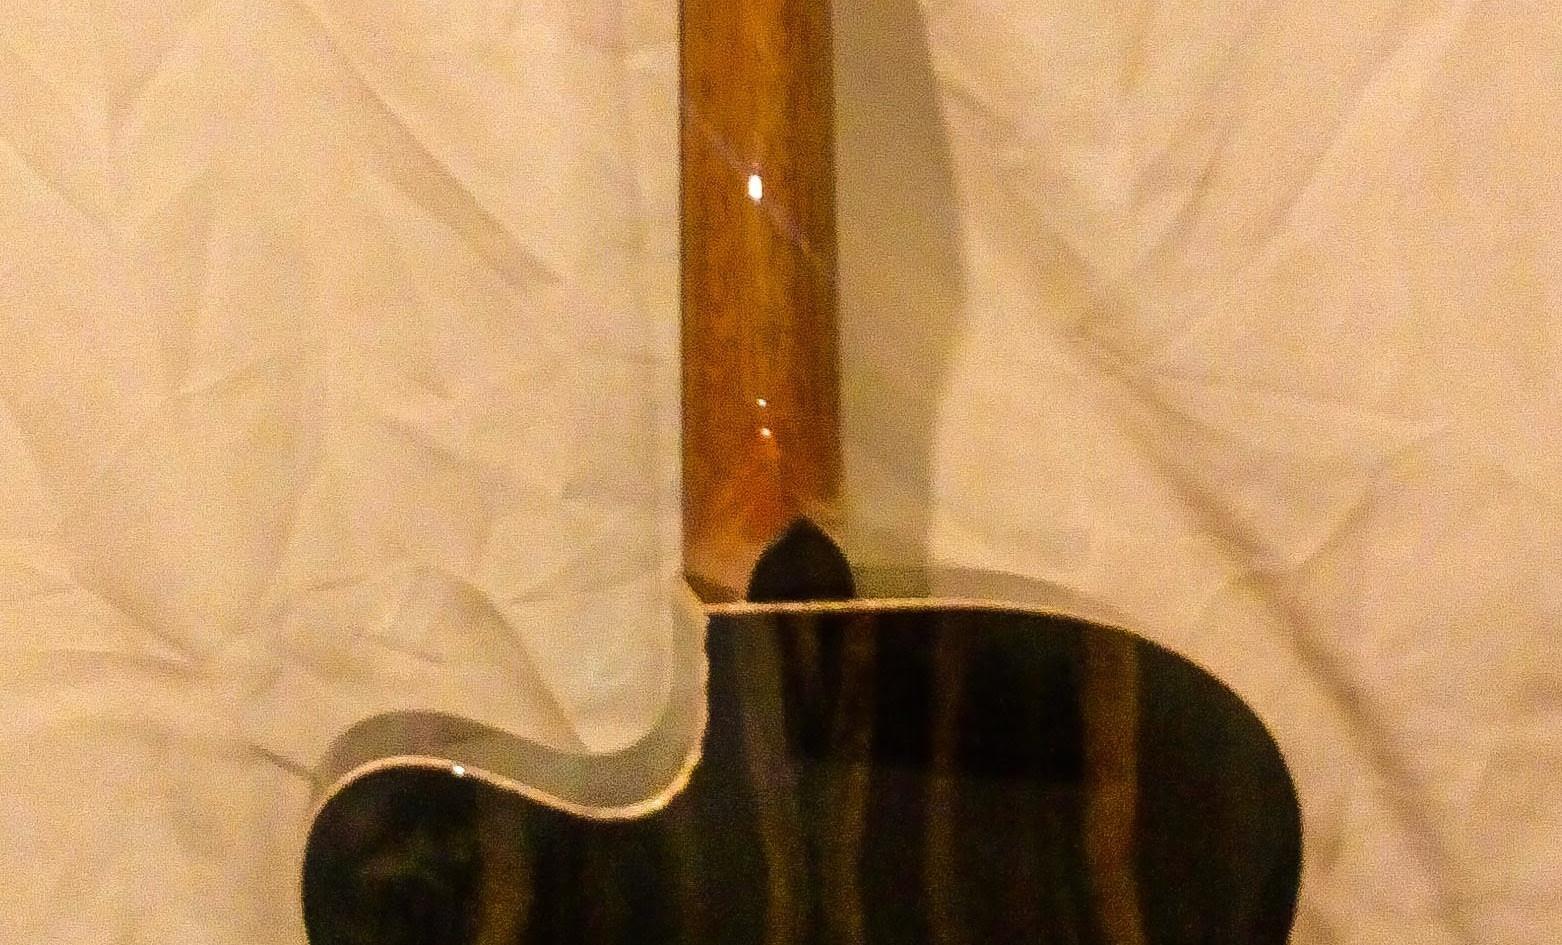 Ebony Irish Handmade OM GuitarEbony Irish Handmade OM Guitar